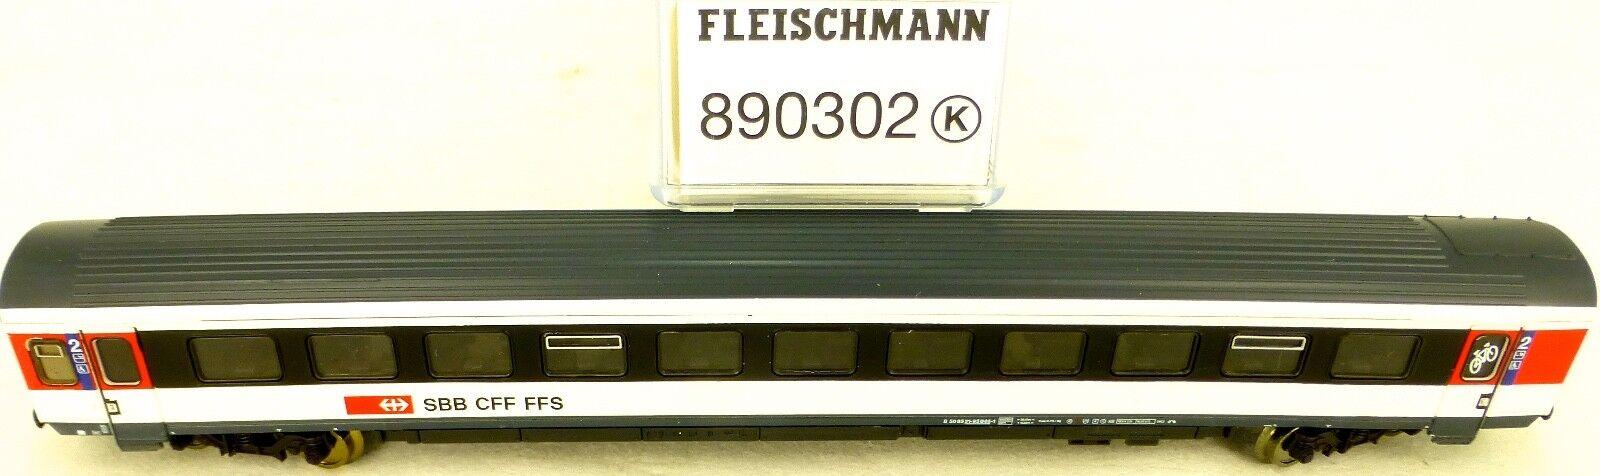 FLEISCHMANN 890302 SBB Vagone treno direttissimo TIPO EW IV EpVI N 1:160 conf.